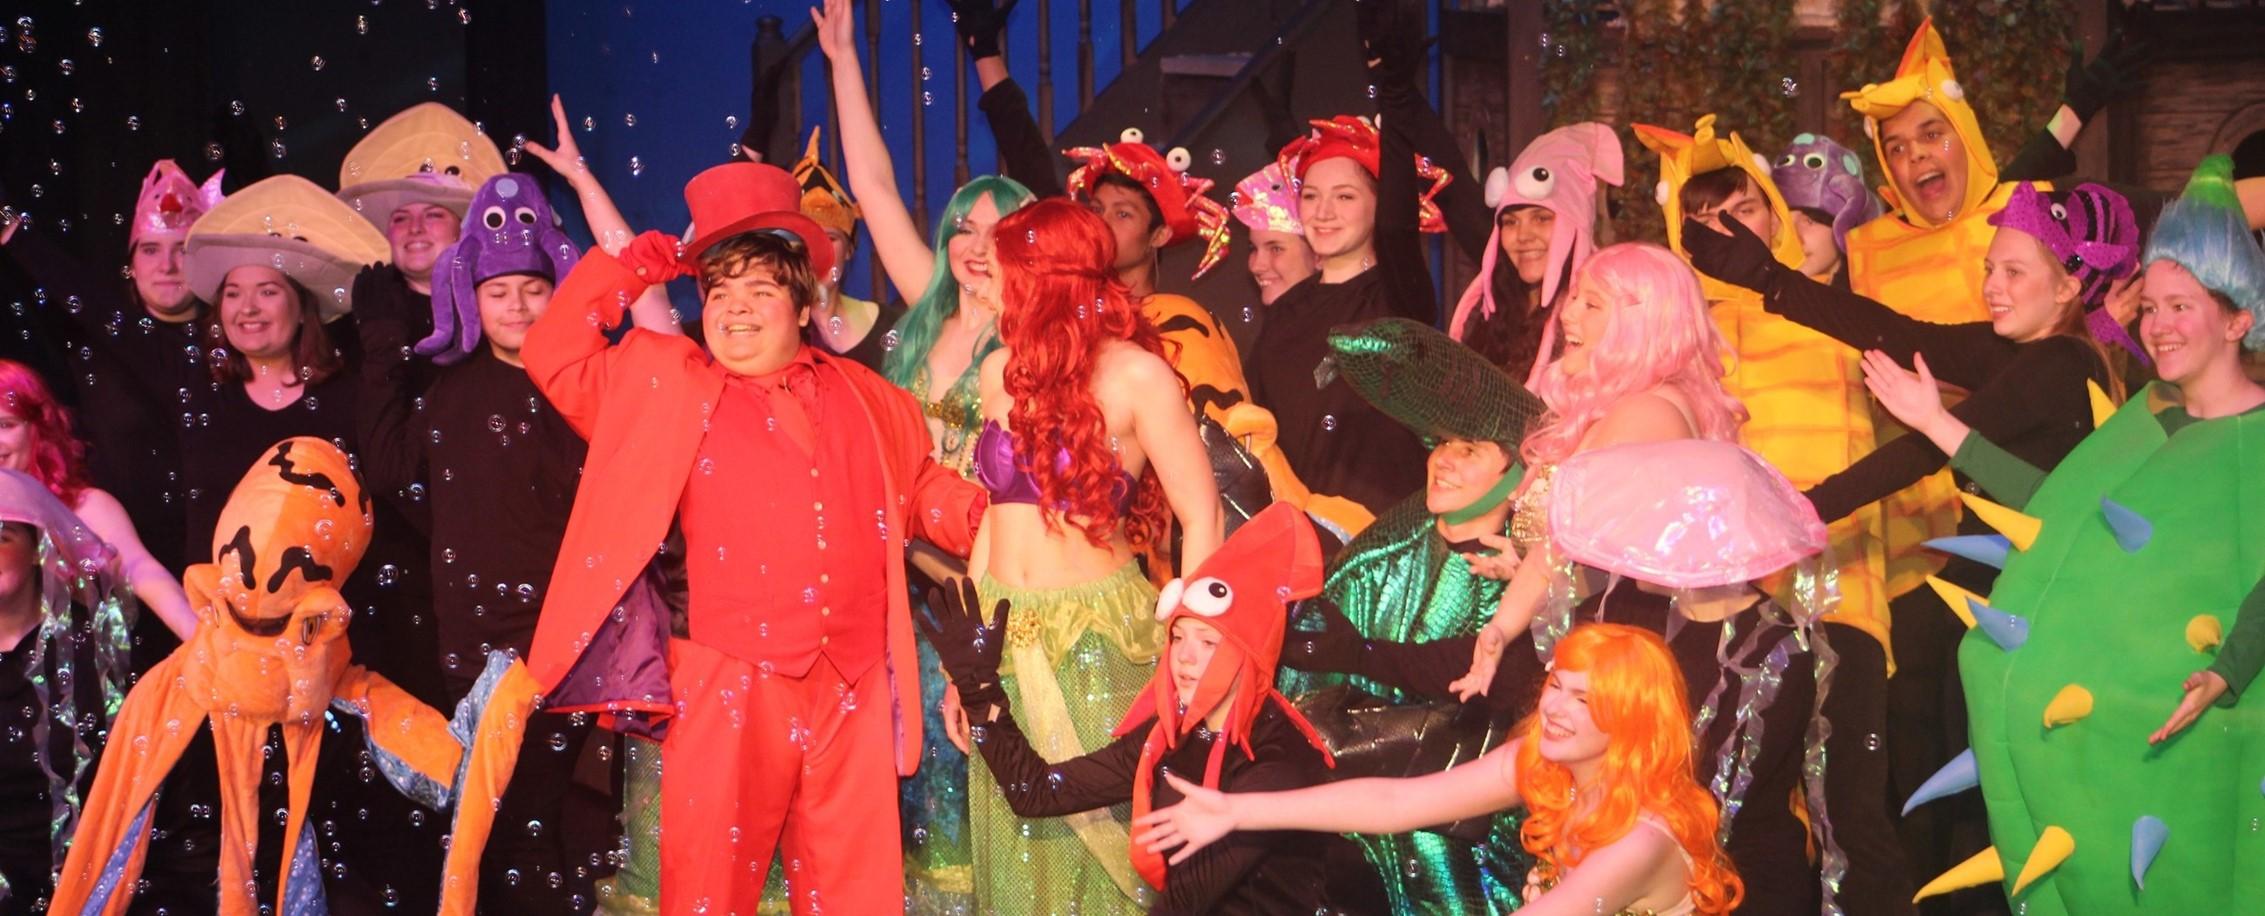 CHS Spring Musical - Disney's The Little Mermaid